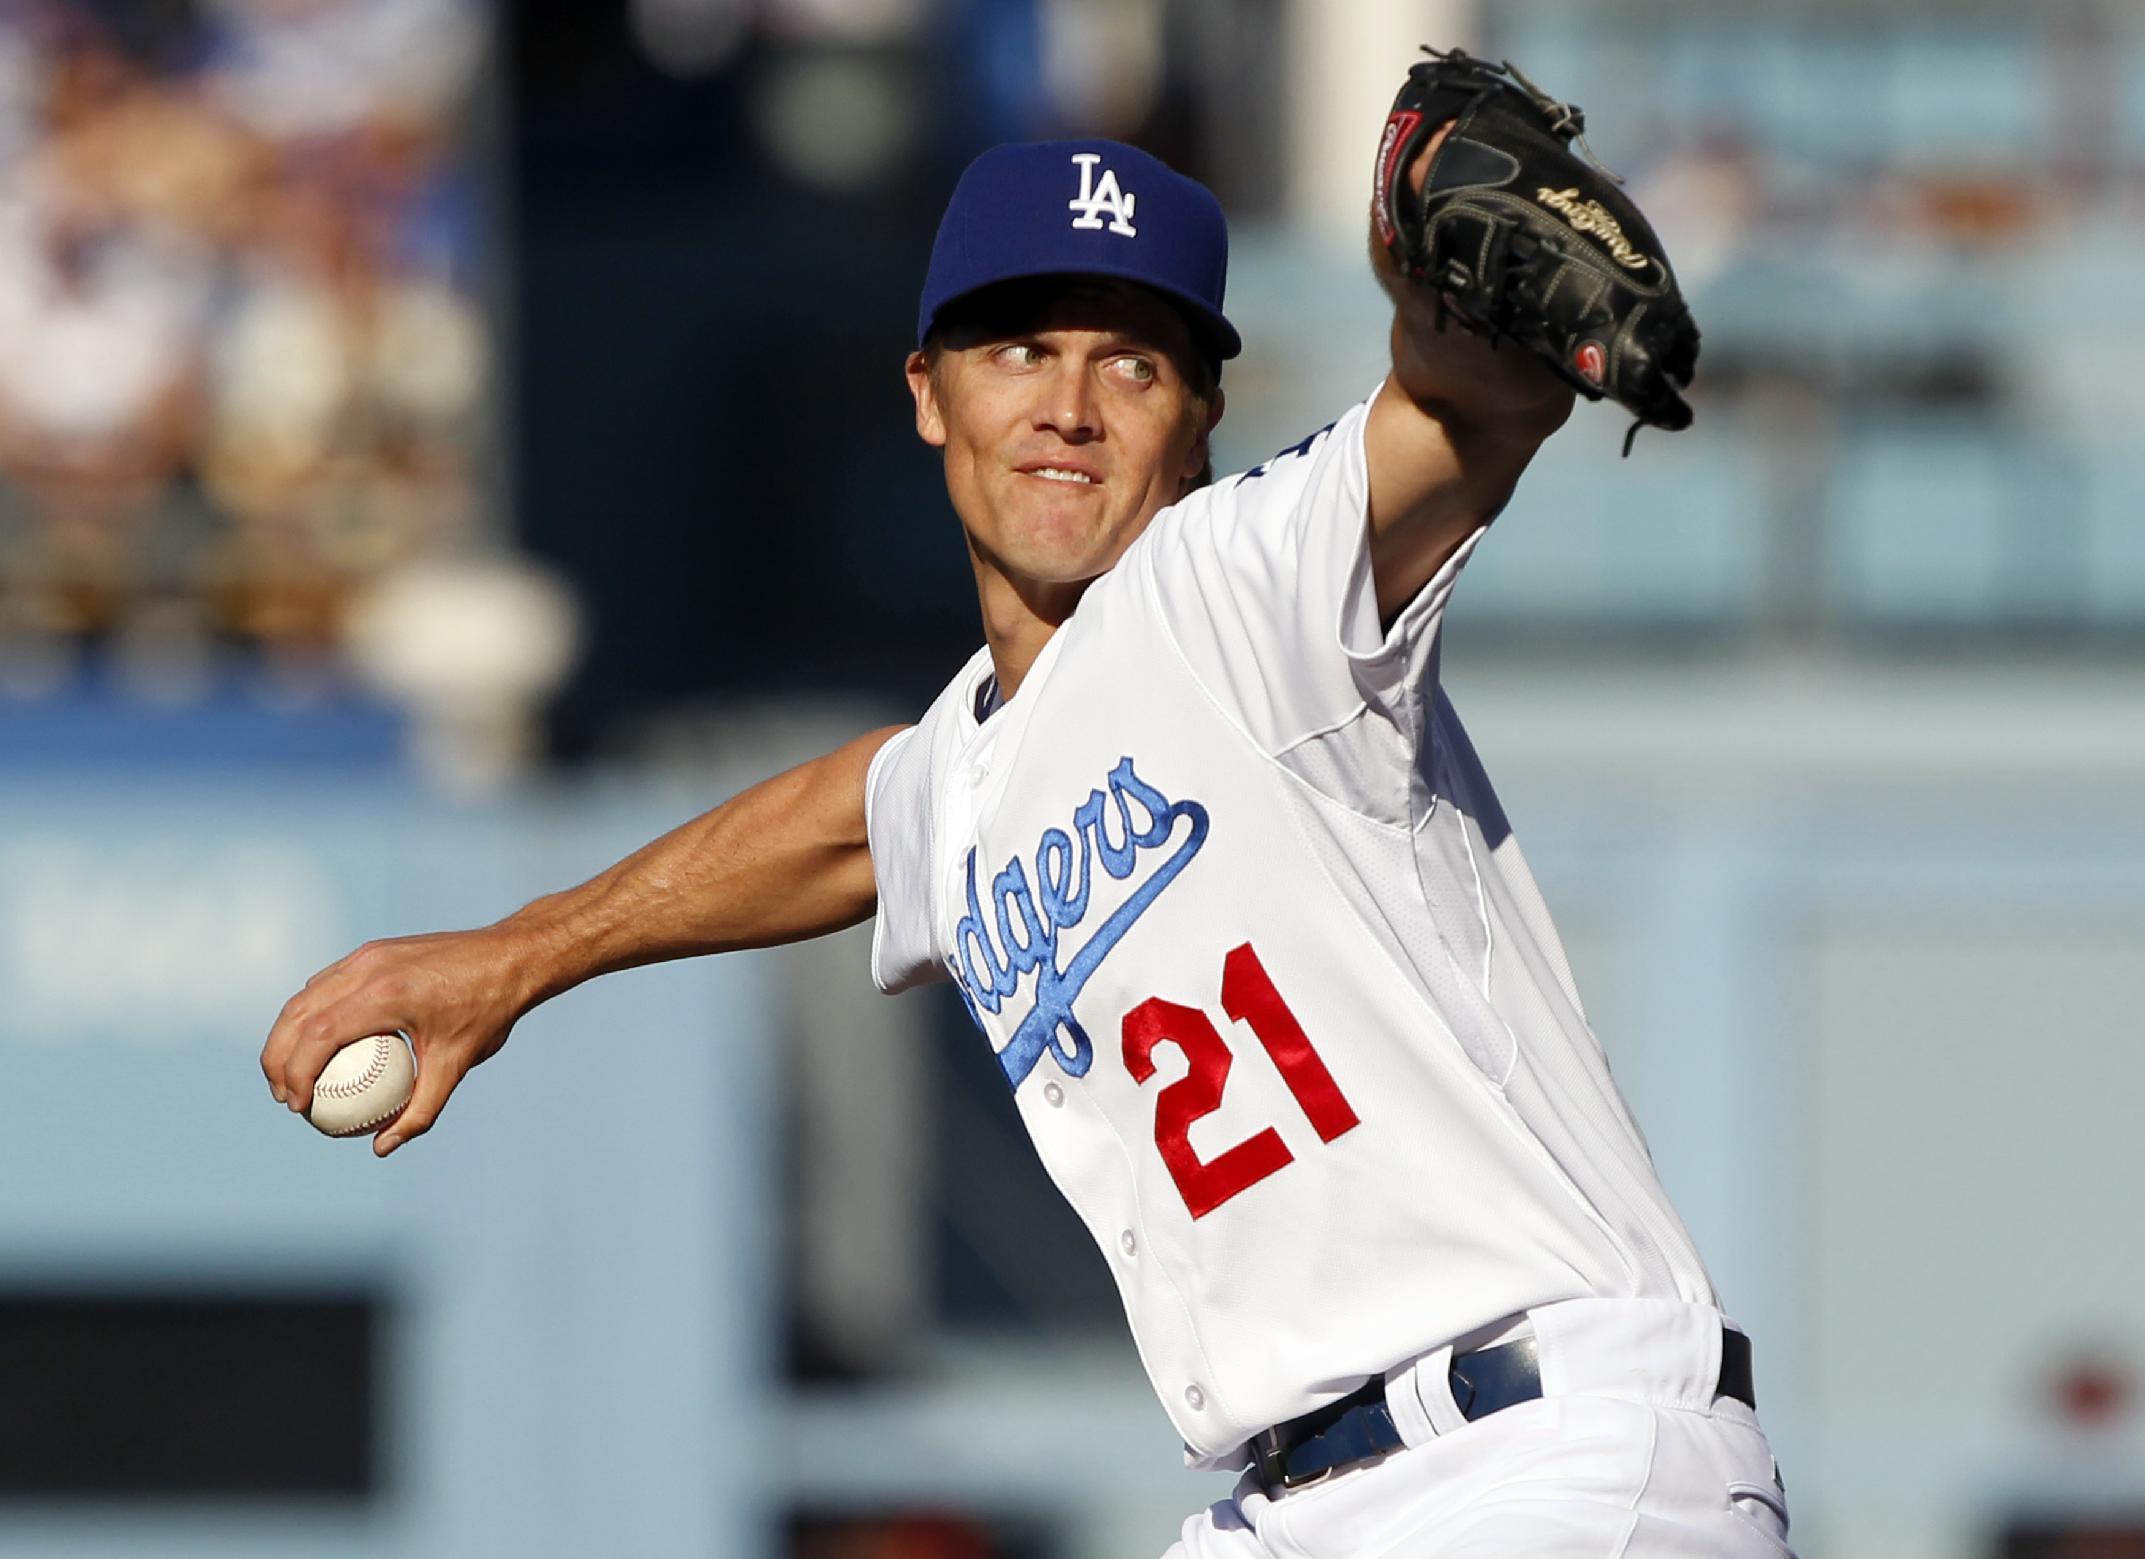 Matt Kemp, Hanley Ramirez and Zack Greinke star in Dodgers 6-2 …